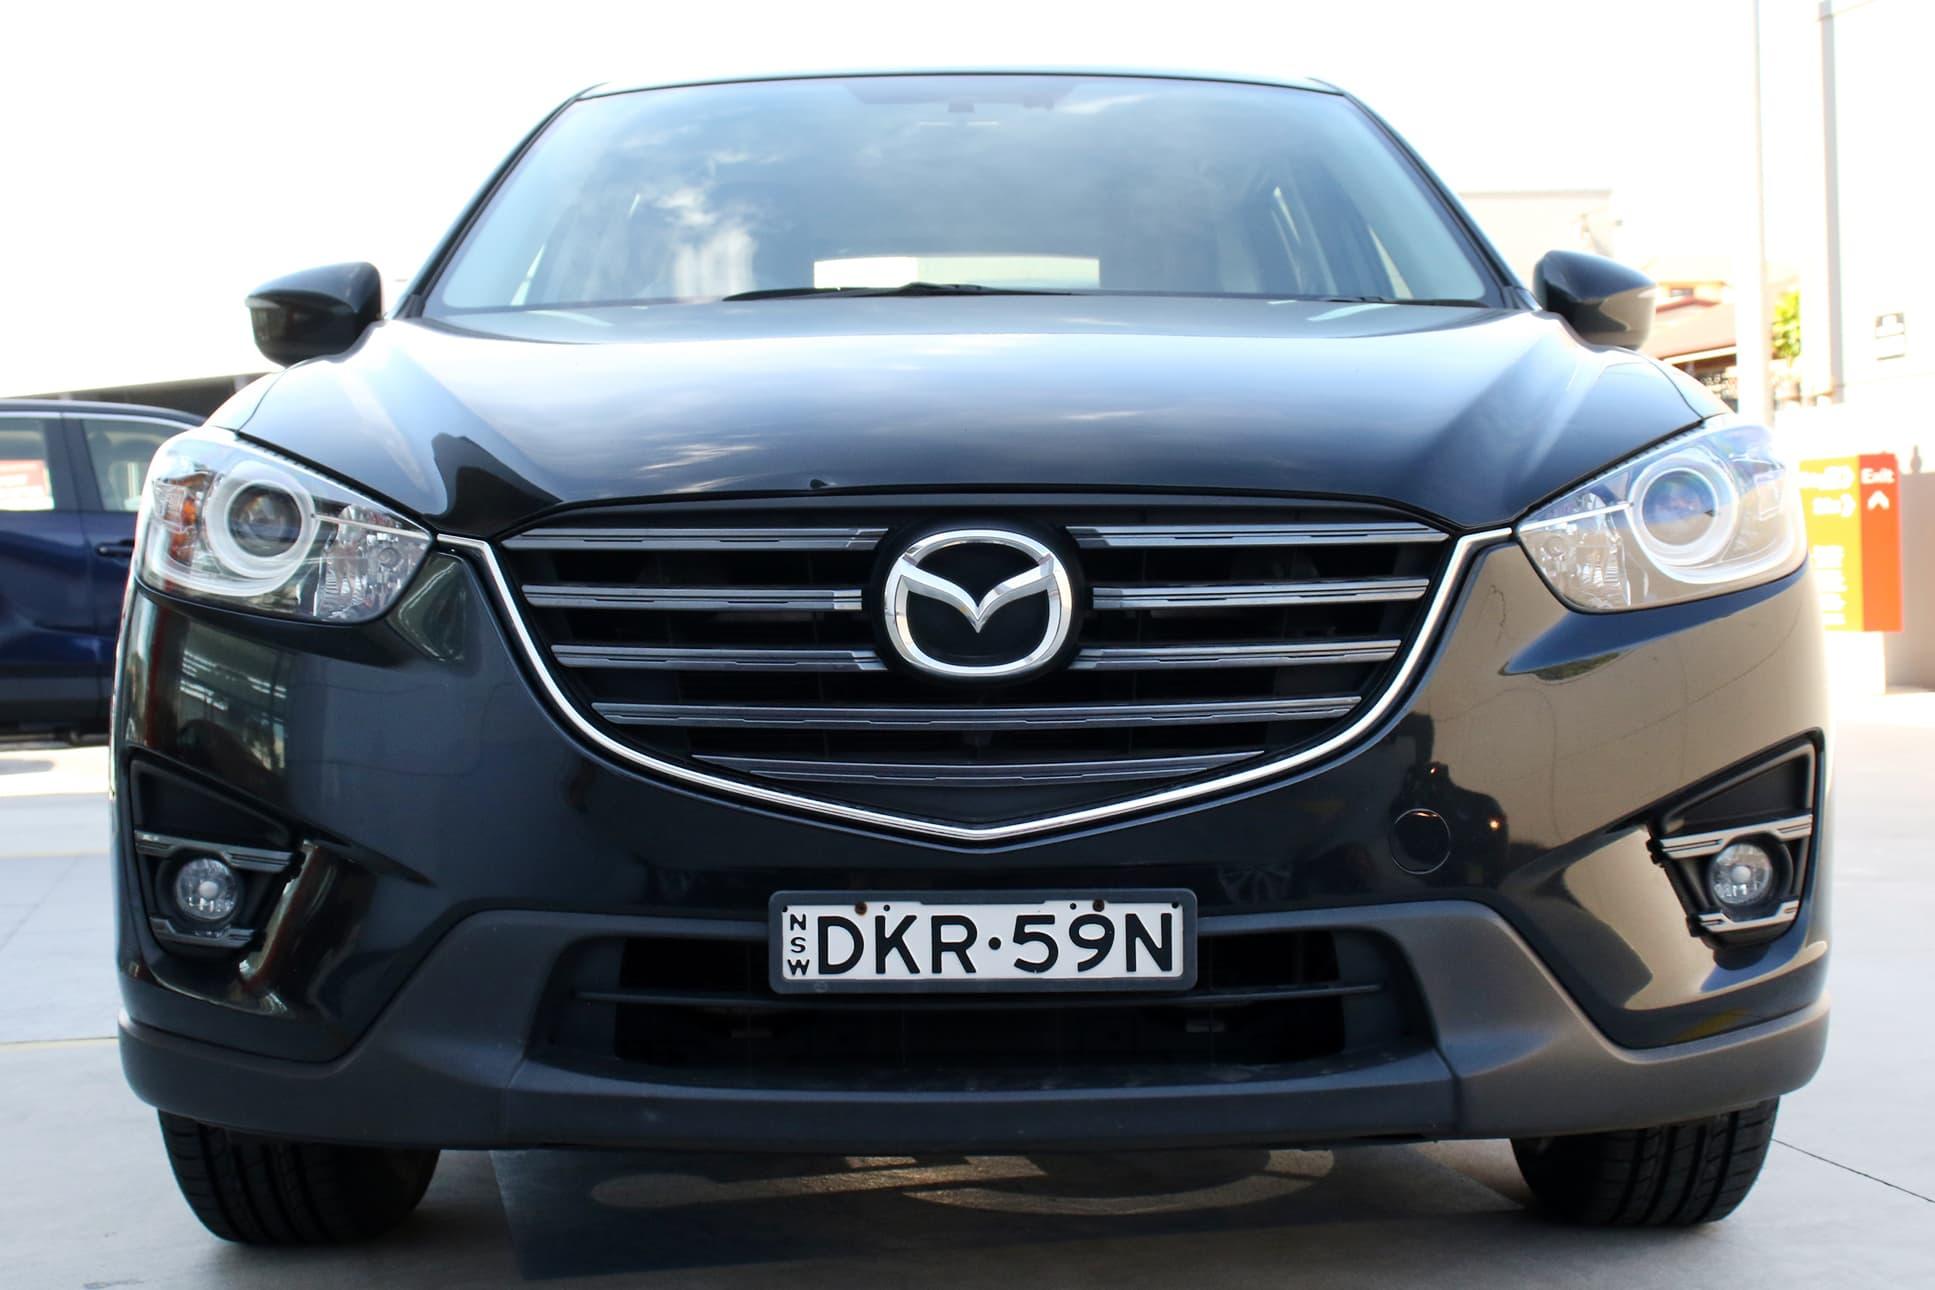 2016 Mazda CX-5 Maxx Sport KE Series 2 Auto - image 5